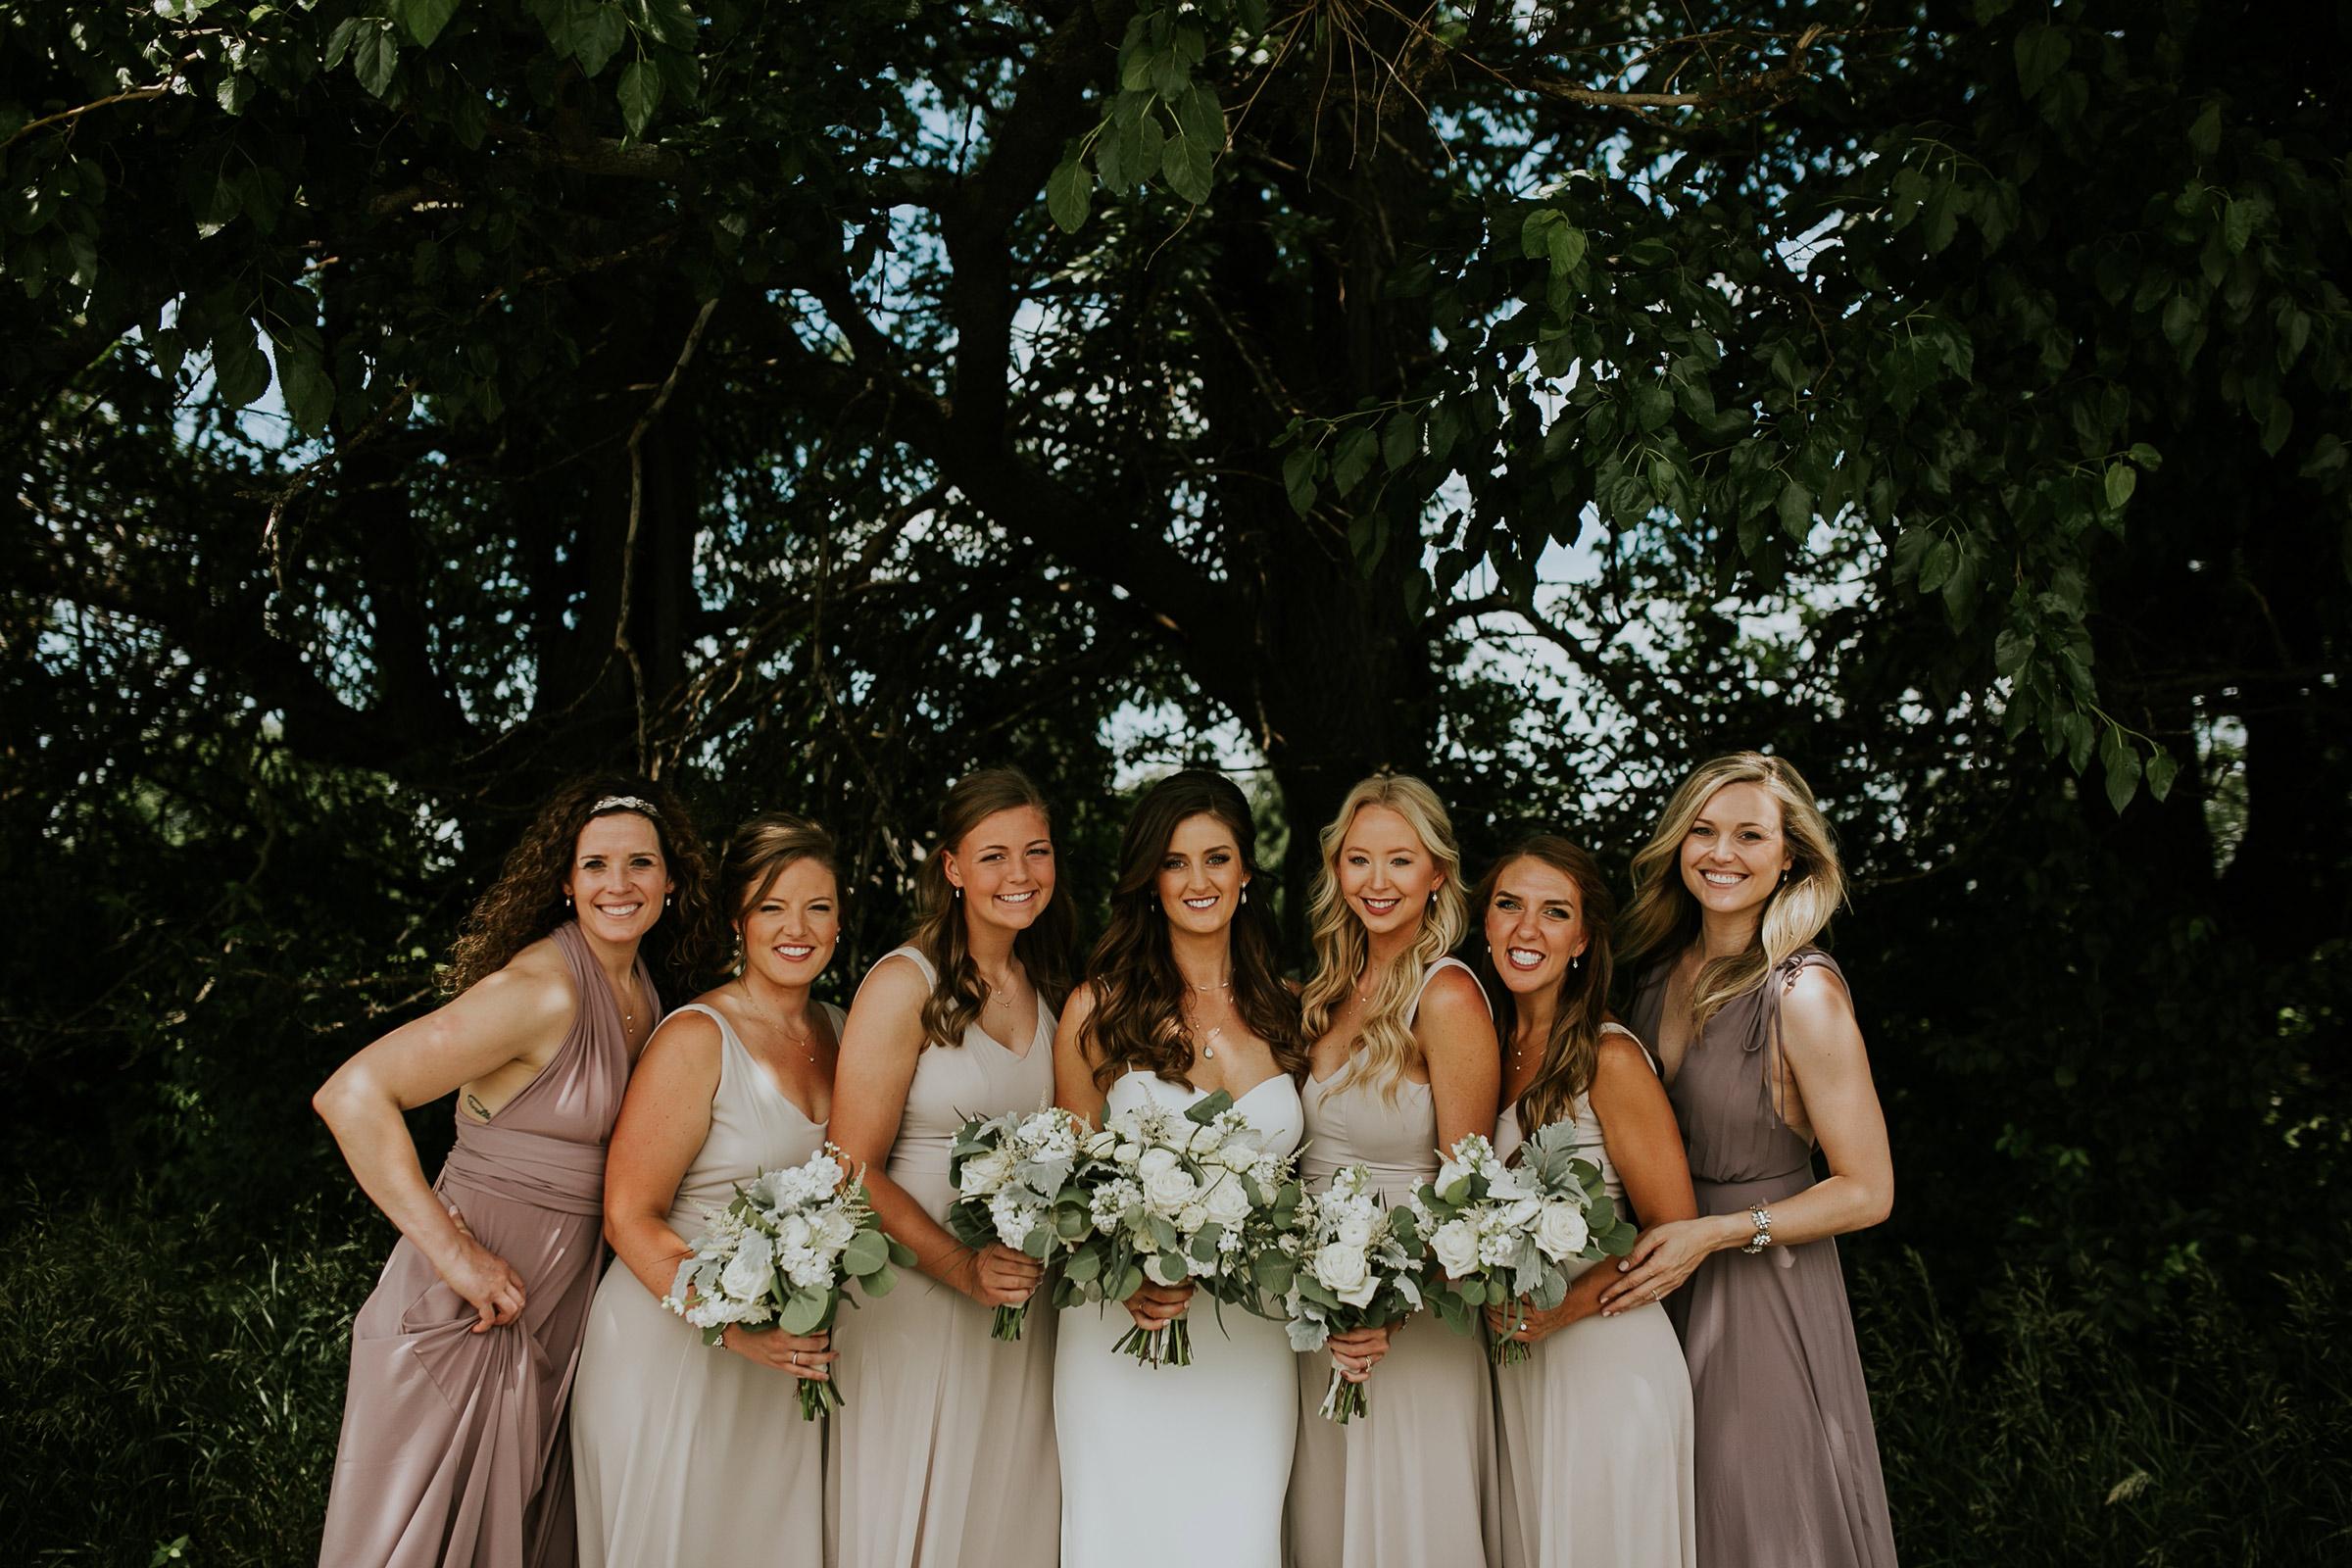 mr-mrs-hull-bride-with-bridesmaids-posing-at-st-boniface-church-waukee-desmoines-iowa-raelyn-ramey-photography-208.jpg